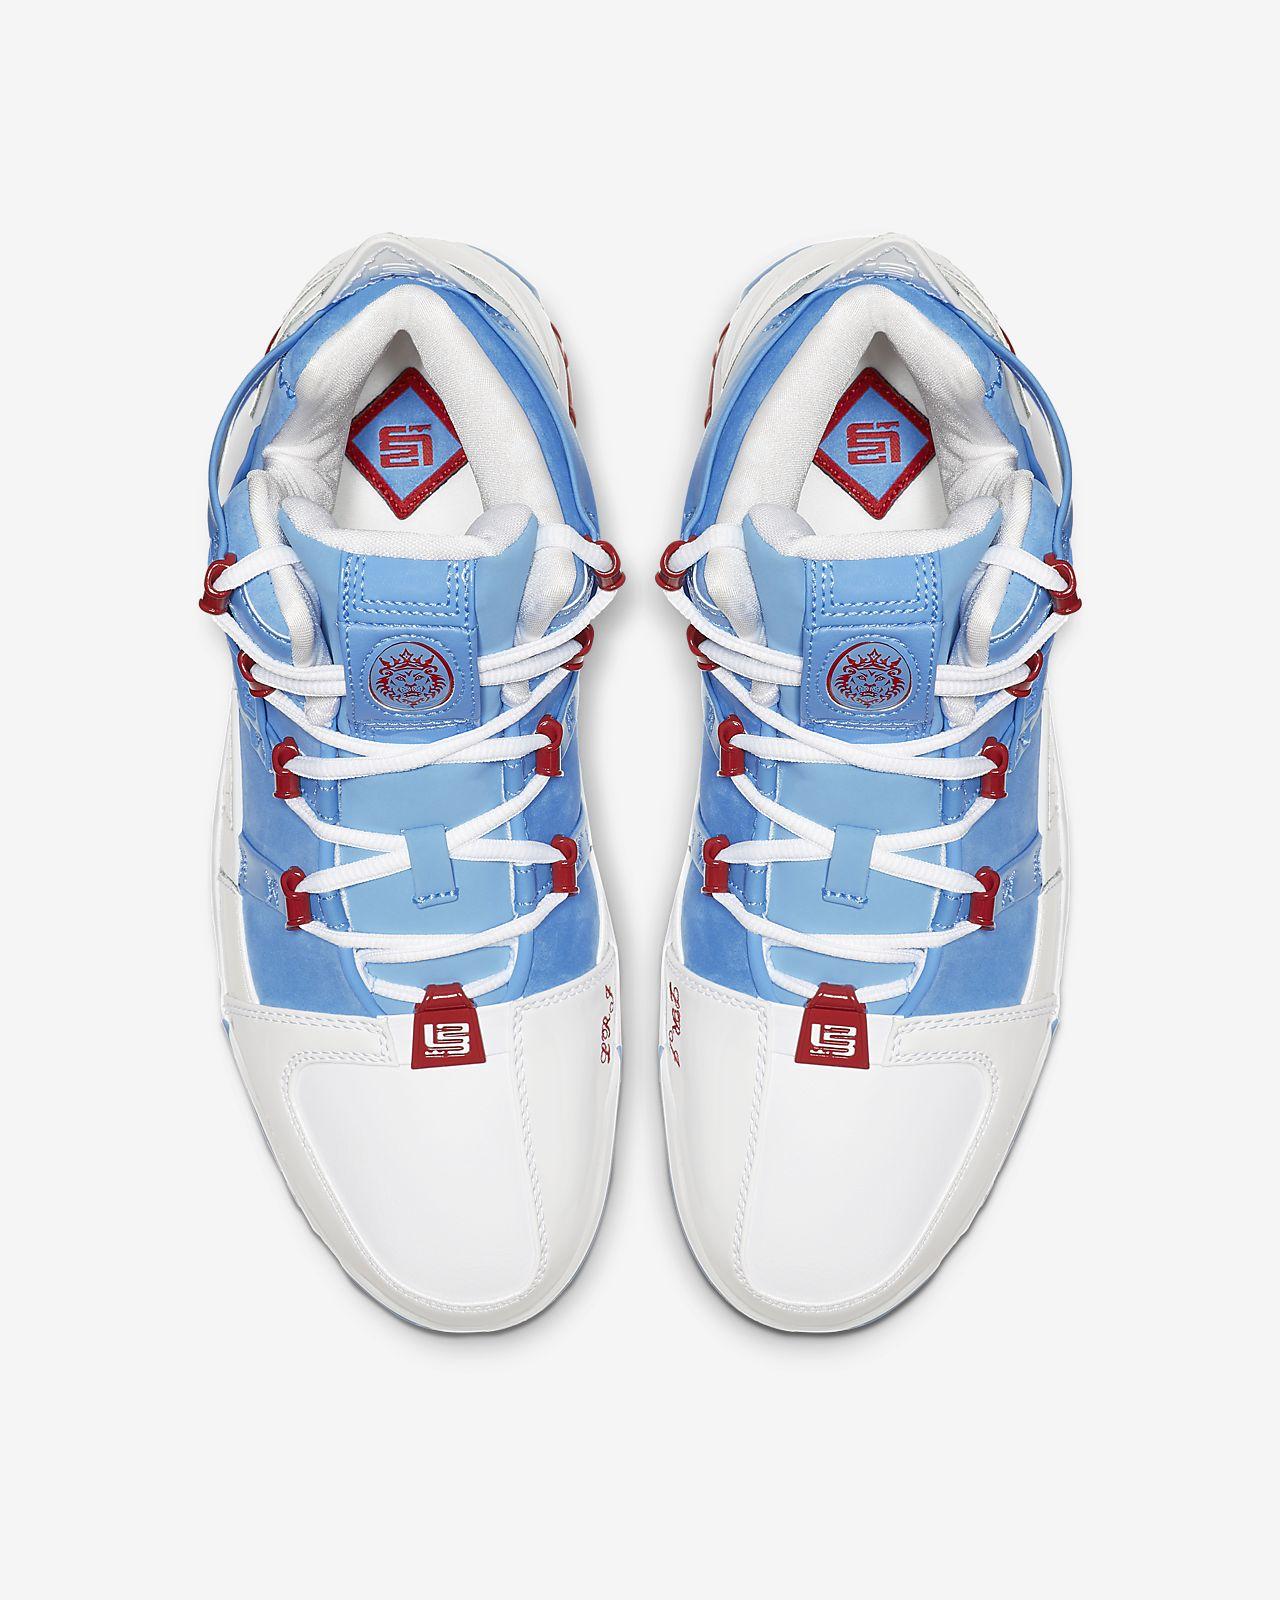 11f63921a0e5 Zoom LeBron 3 QS Men s Shoe. Nike.com AU